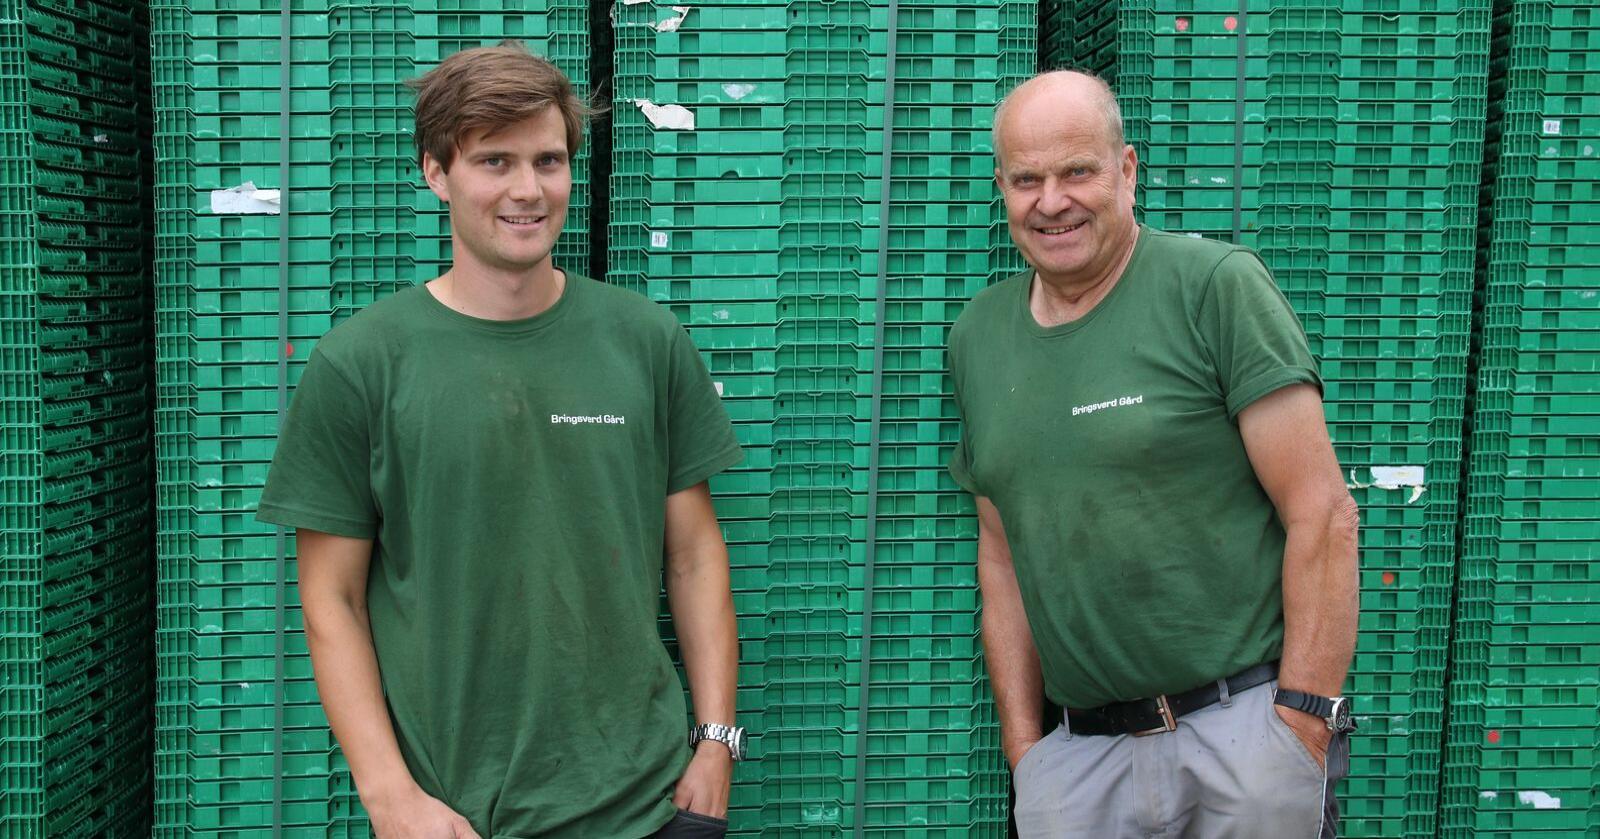 Samarbeider godt: Bernhard Arnevik (24)